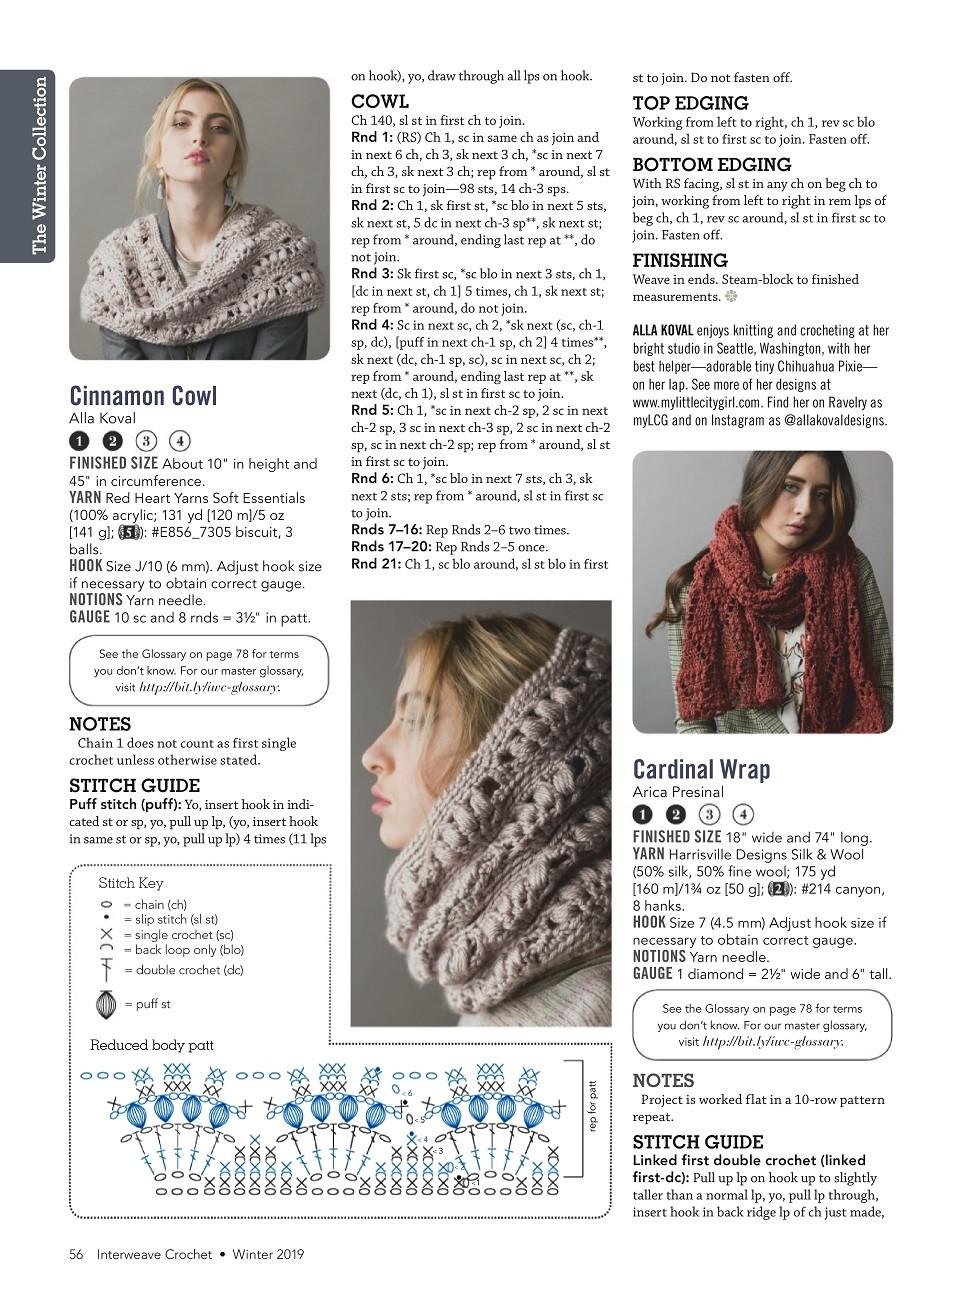 Interweave Crochet Winter 2019-57